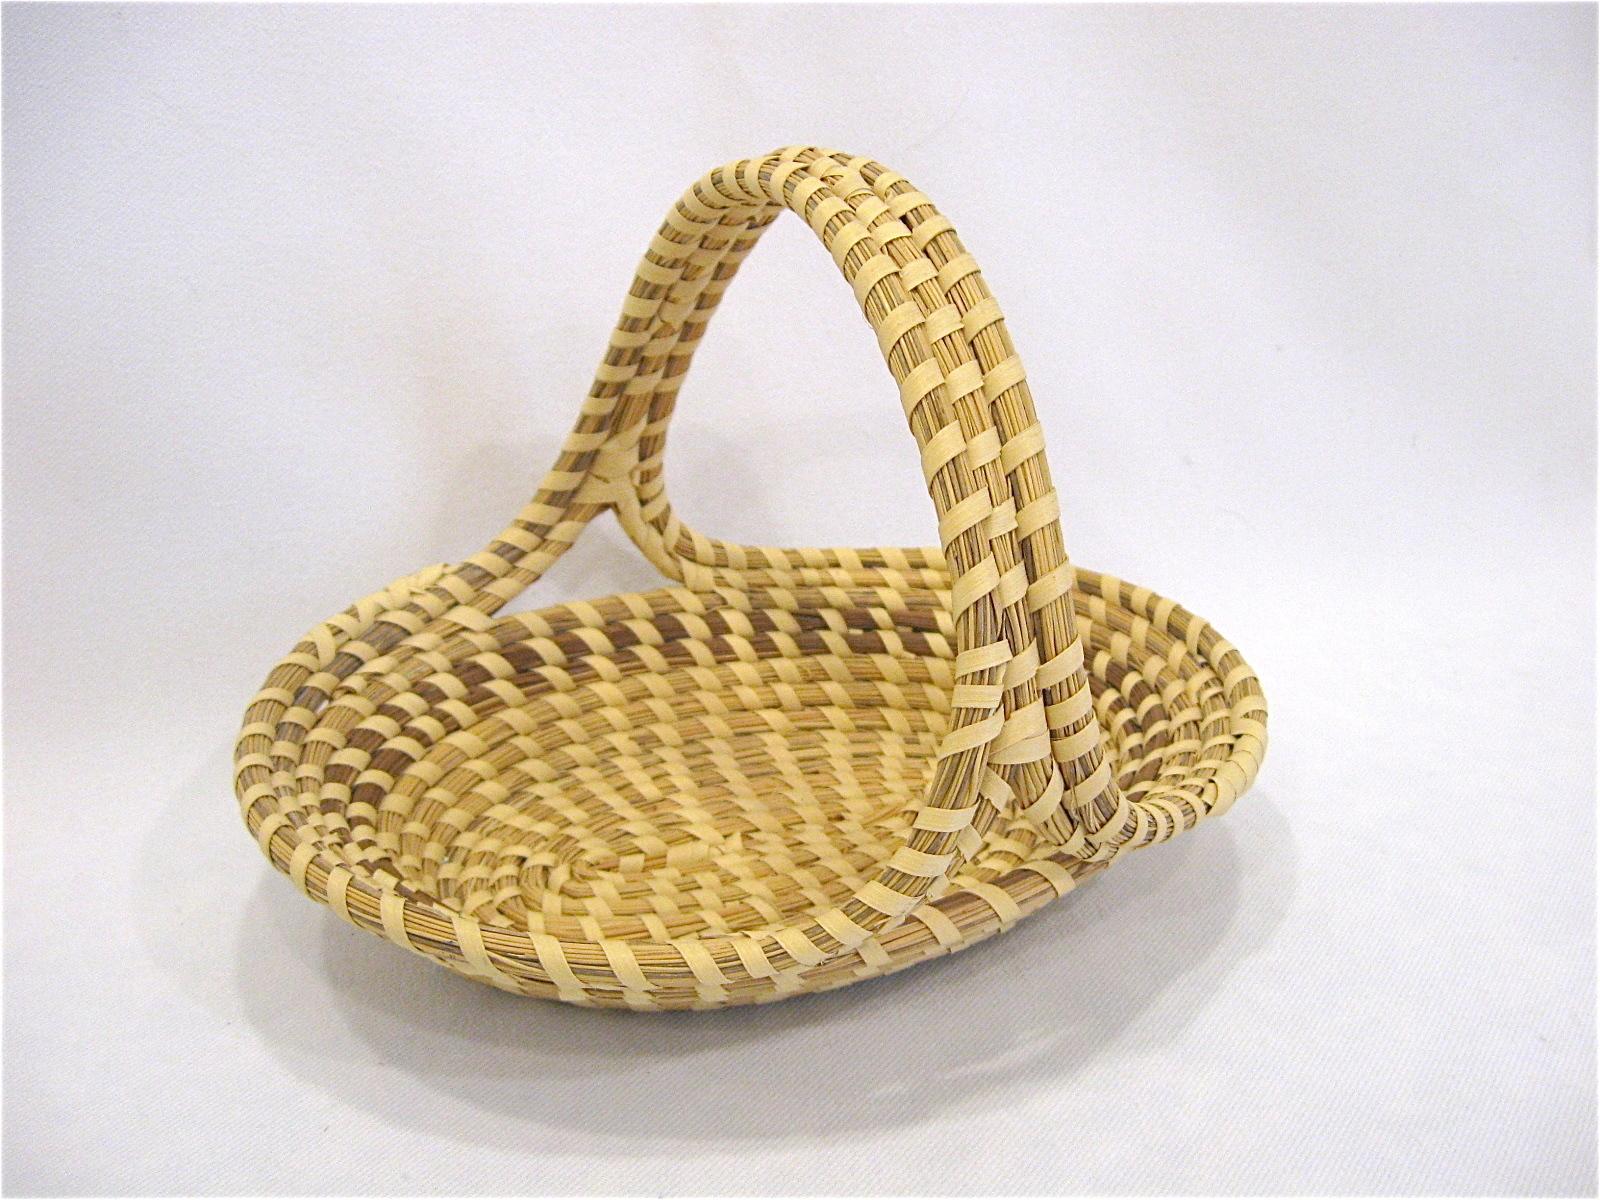 Handmade Baskets In Charleston : Charleston sweetgrass basket oval with handle handmade